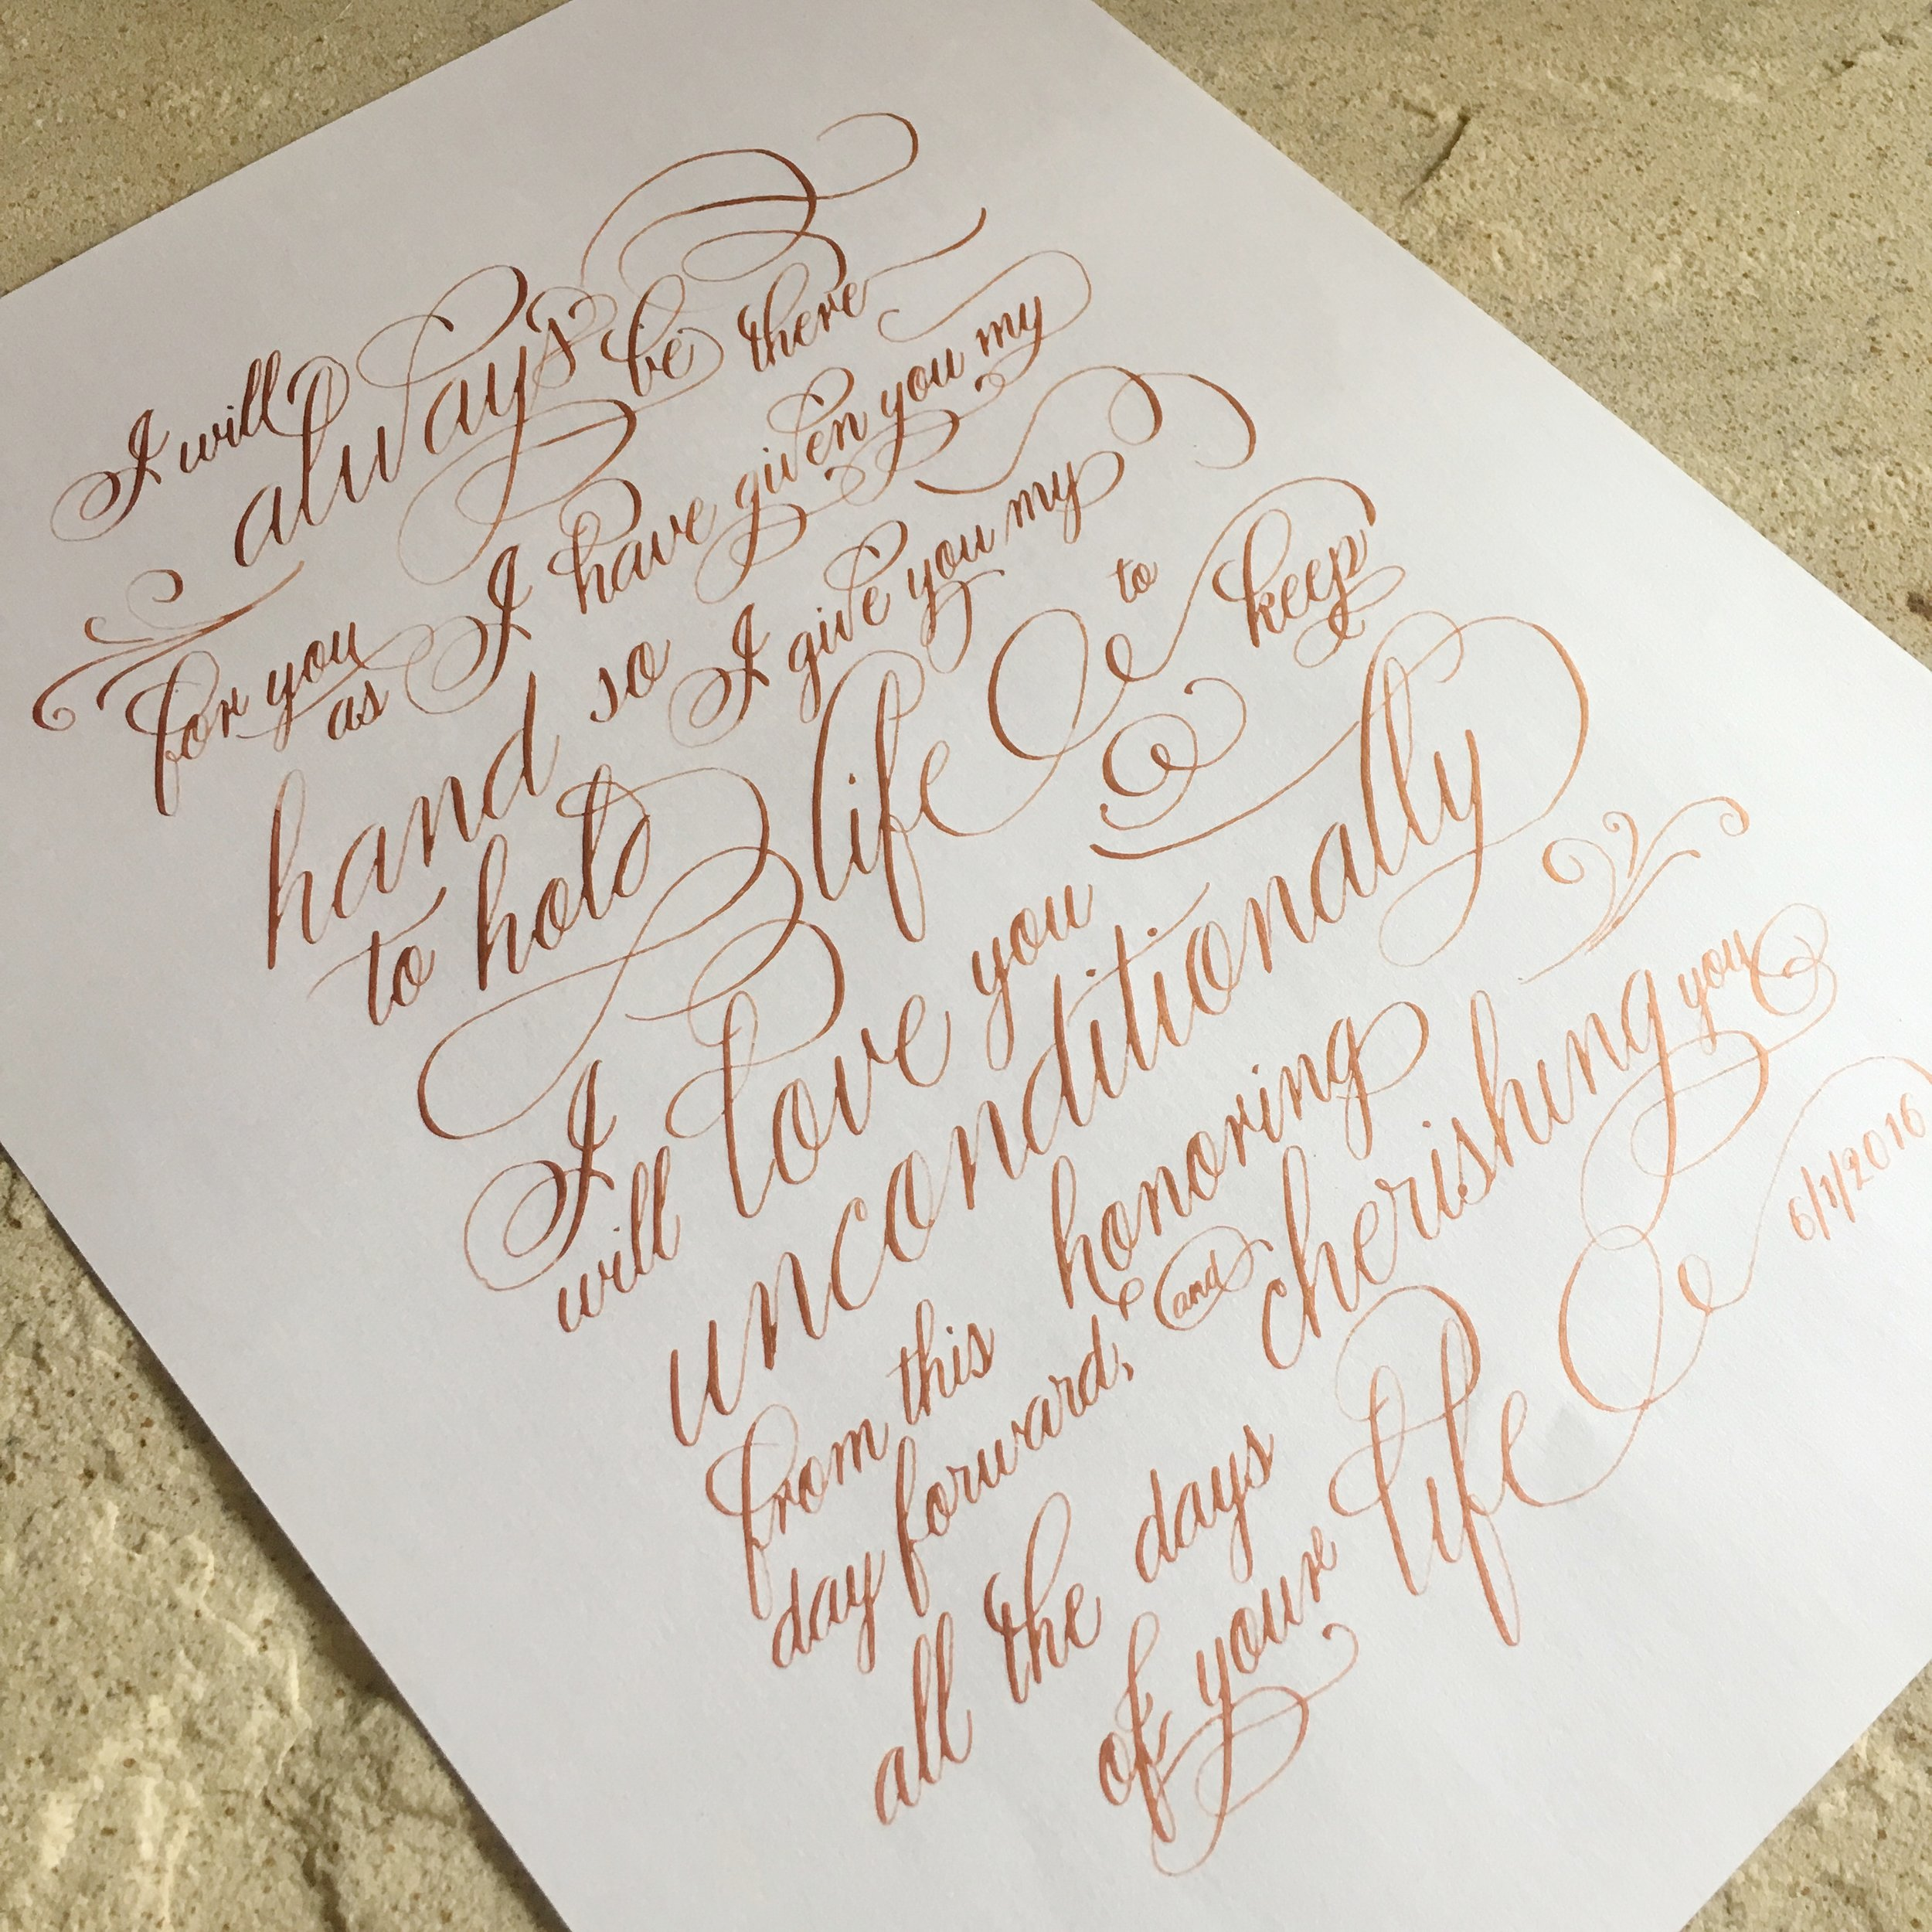 Central PA, York PA, JesSmith Designs, custom, wedding, invitations, bridal, announcements, save the date, birth, baby, motherhood, hanover, calligraphy, handlettering, wedding invitations, lancaster, gettysburg-07-18 19.41.51.jpg